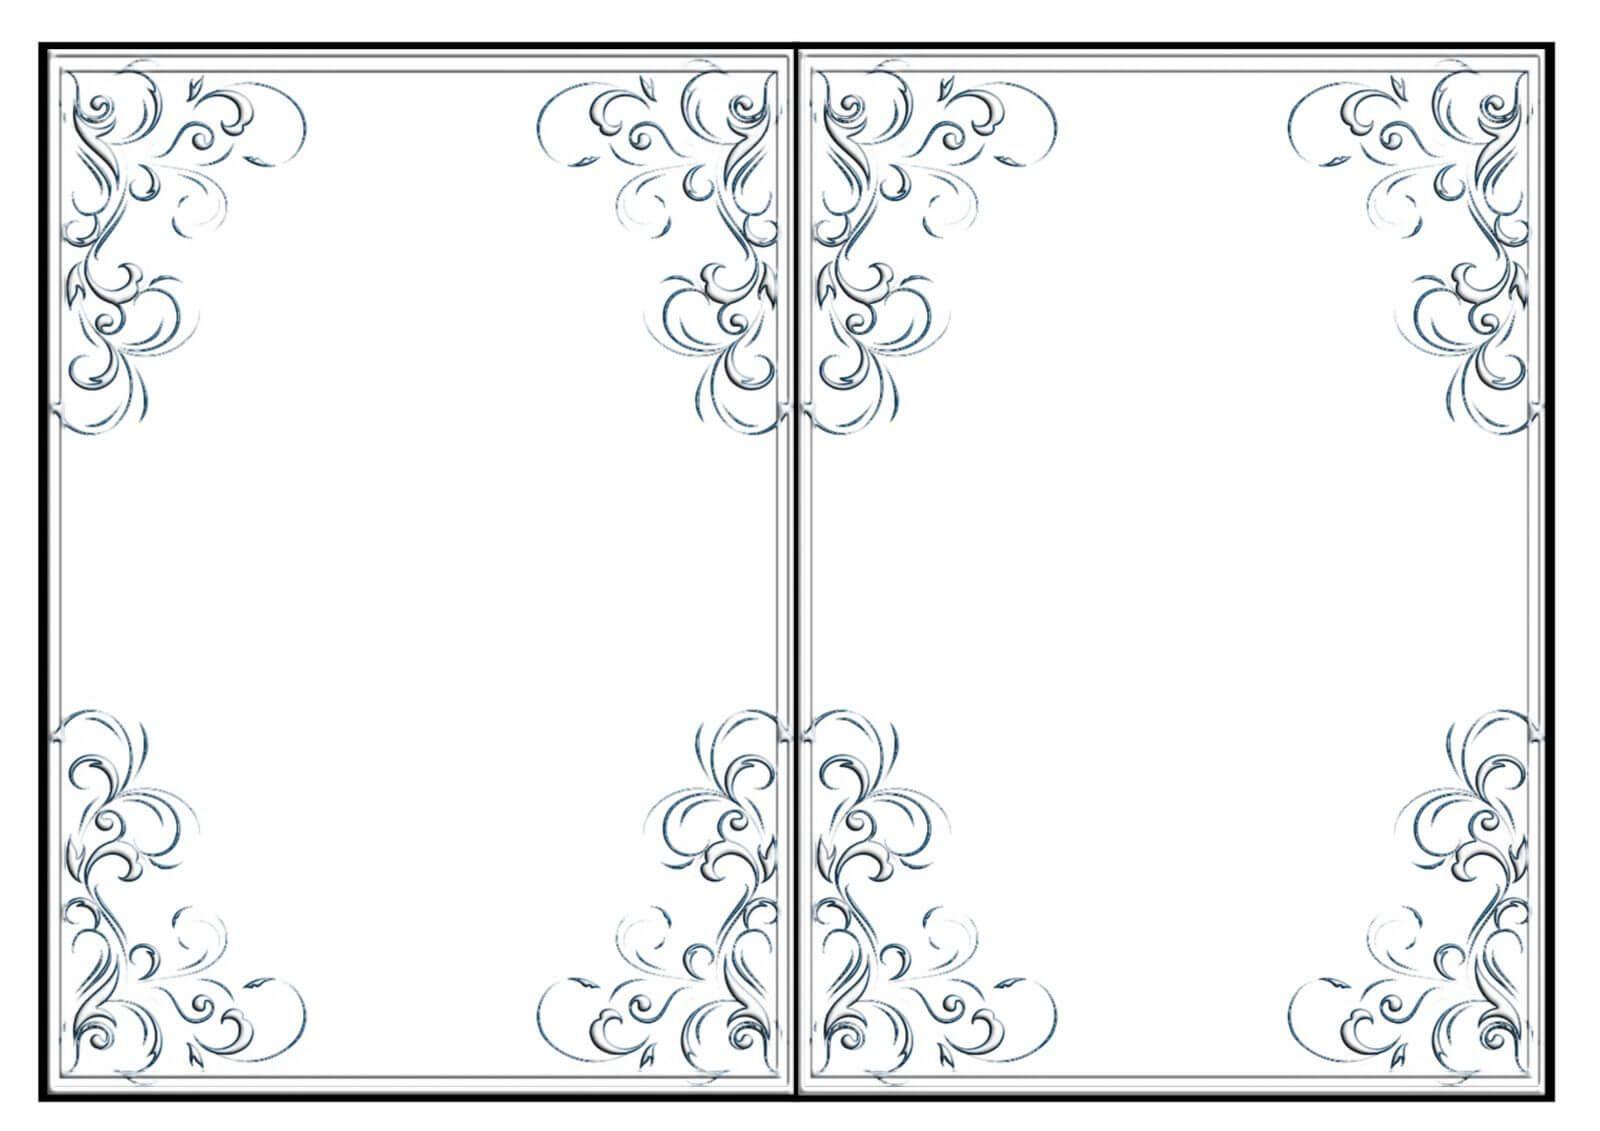 002 Template Ideas Quarter Fold Card Free Imnettle Printable Regarding Quarter Fold Card Template